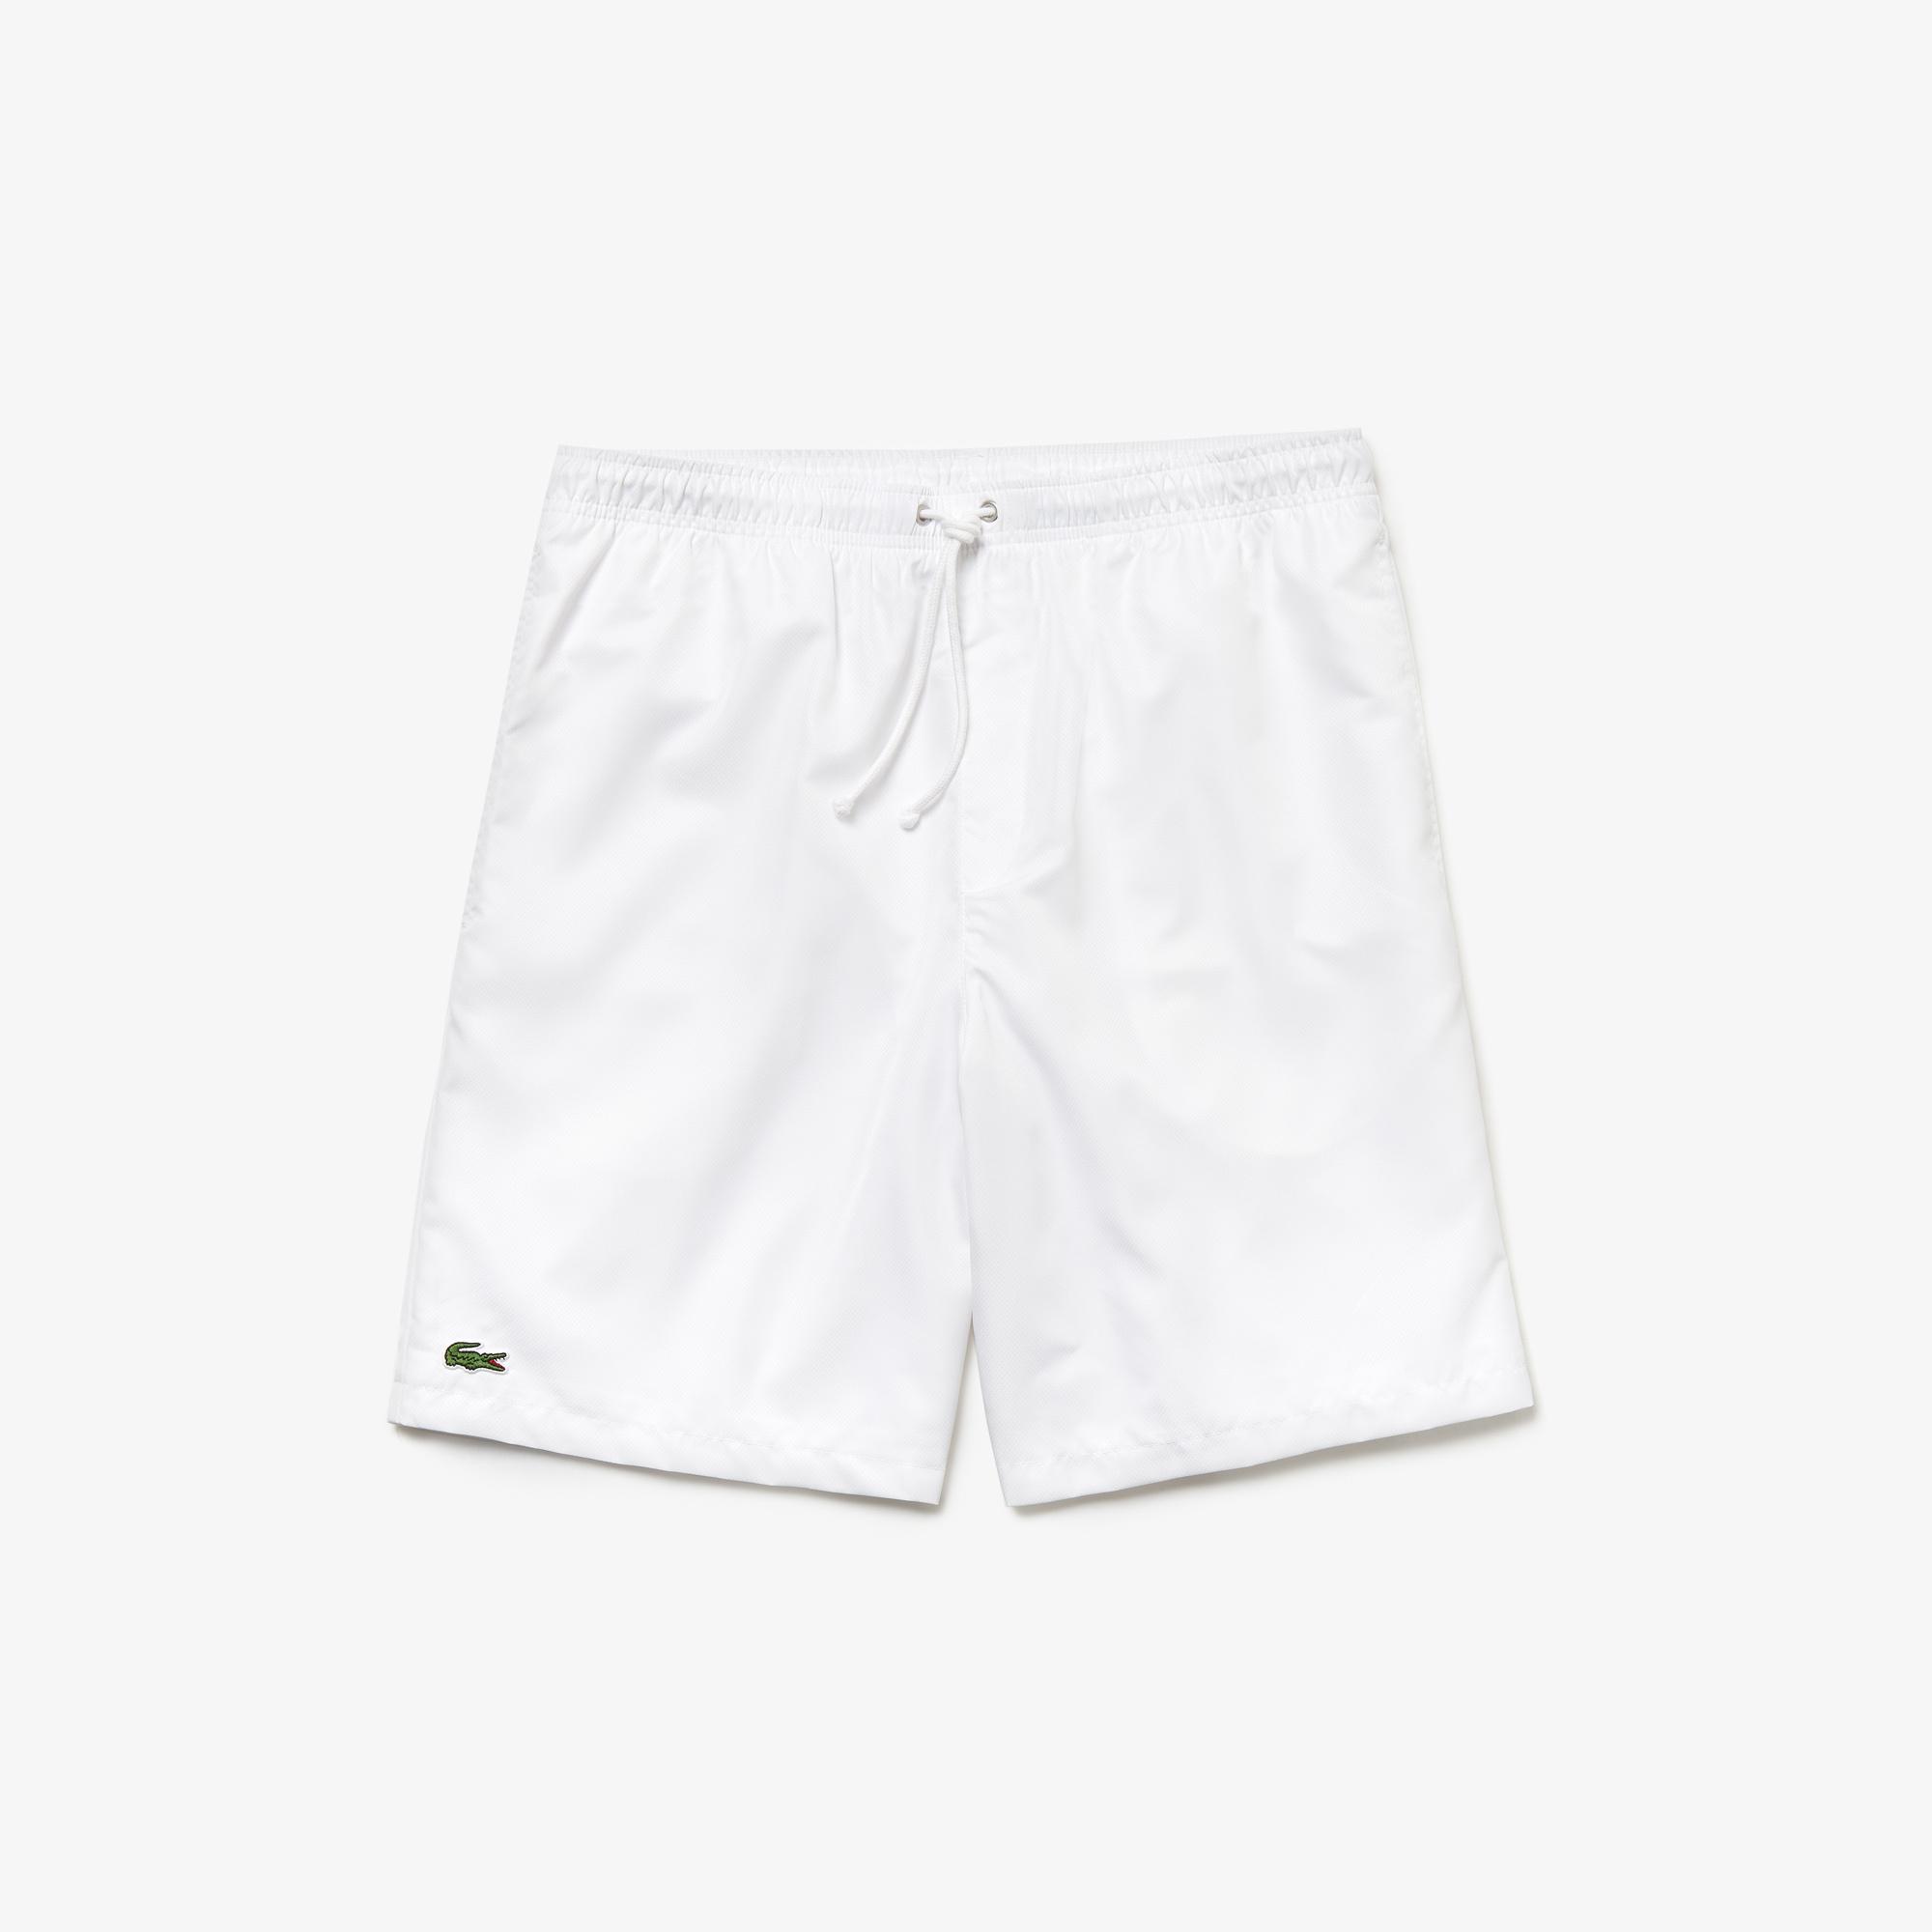 Lacoste Short White-1